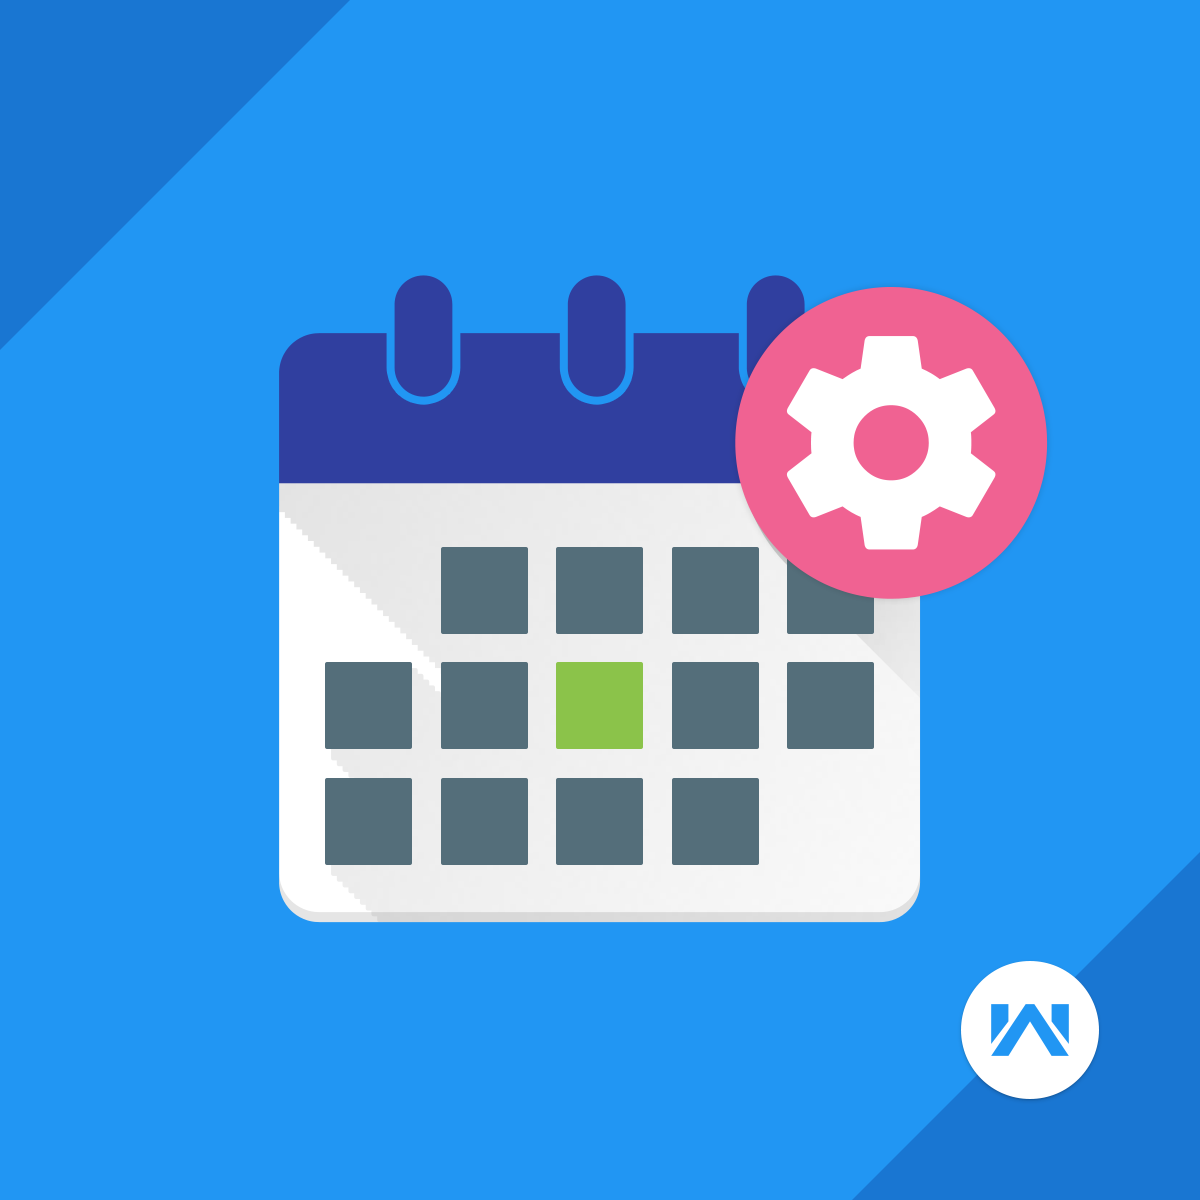 Shopify Calendar Apps by Webkul software pvt ltd